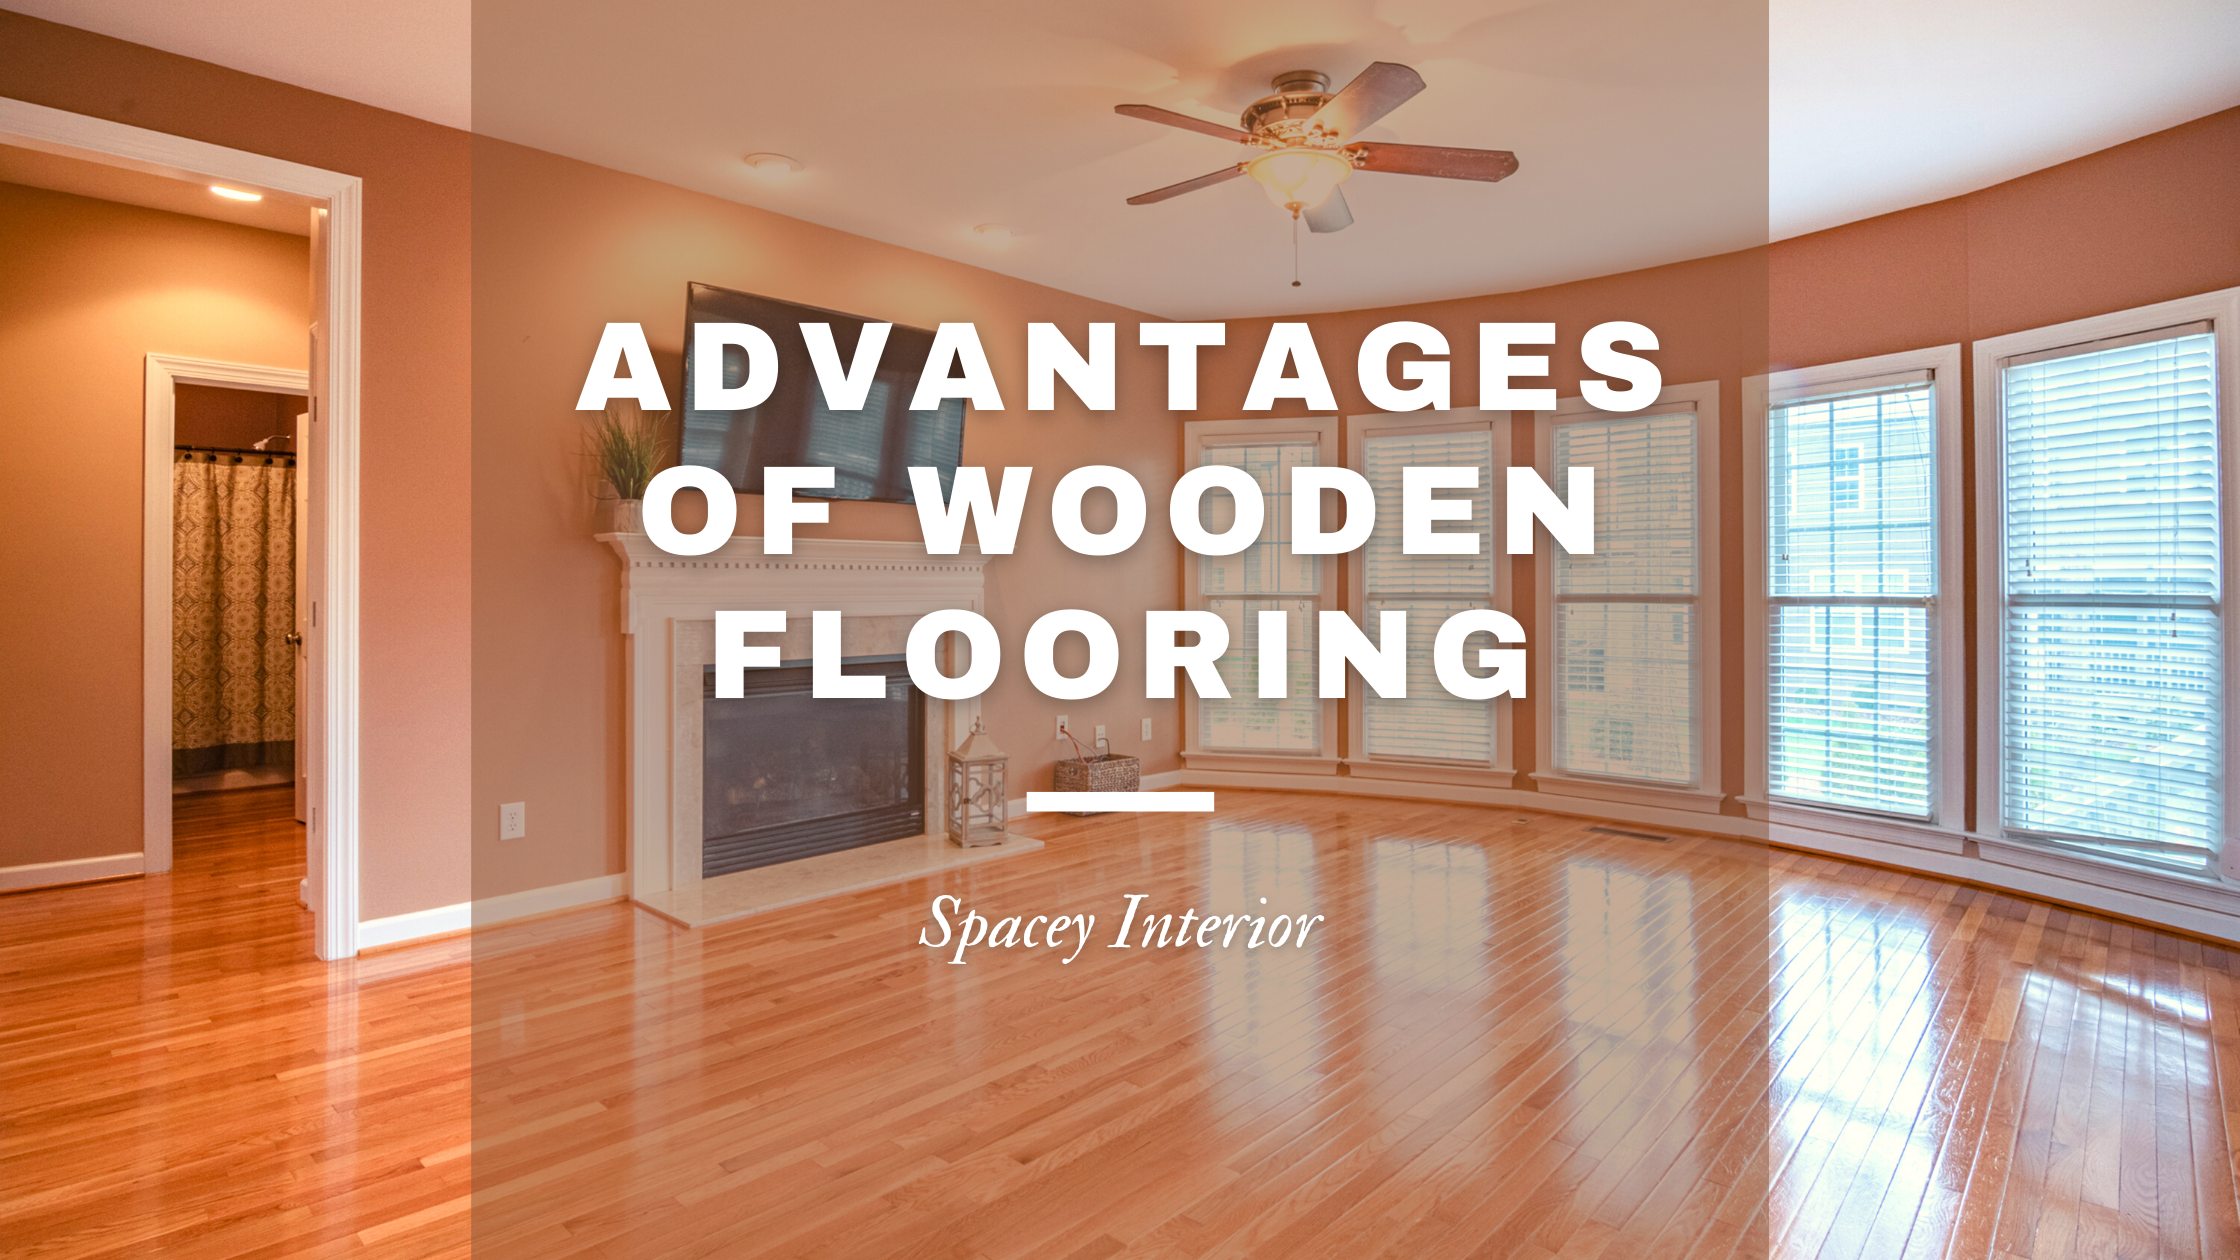 Advantages of wooden flooring